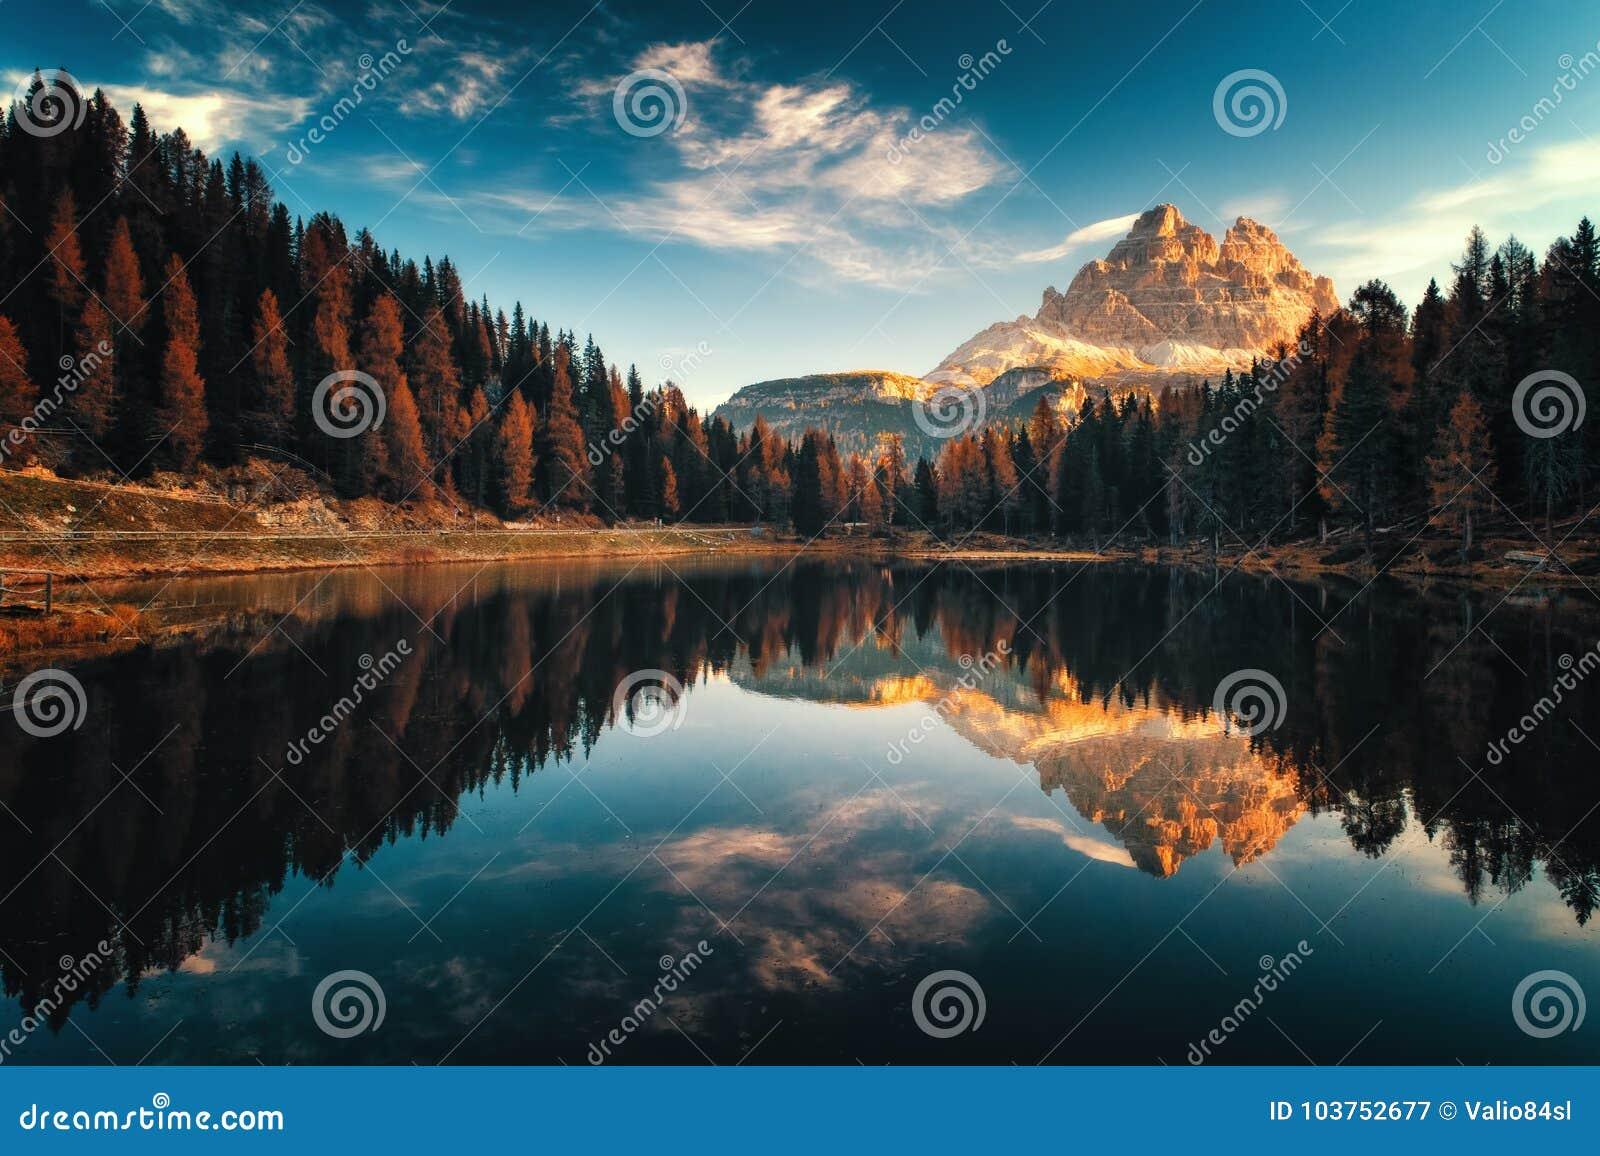 Aerial view of Lago Antorno, Dolomites, Lake mountain landscape